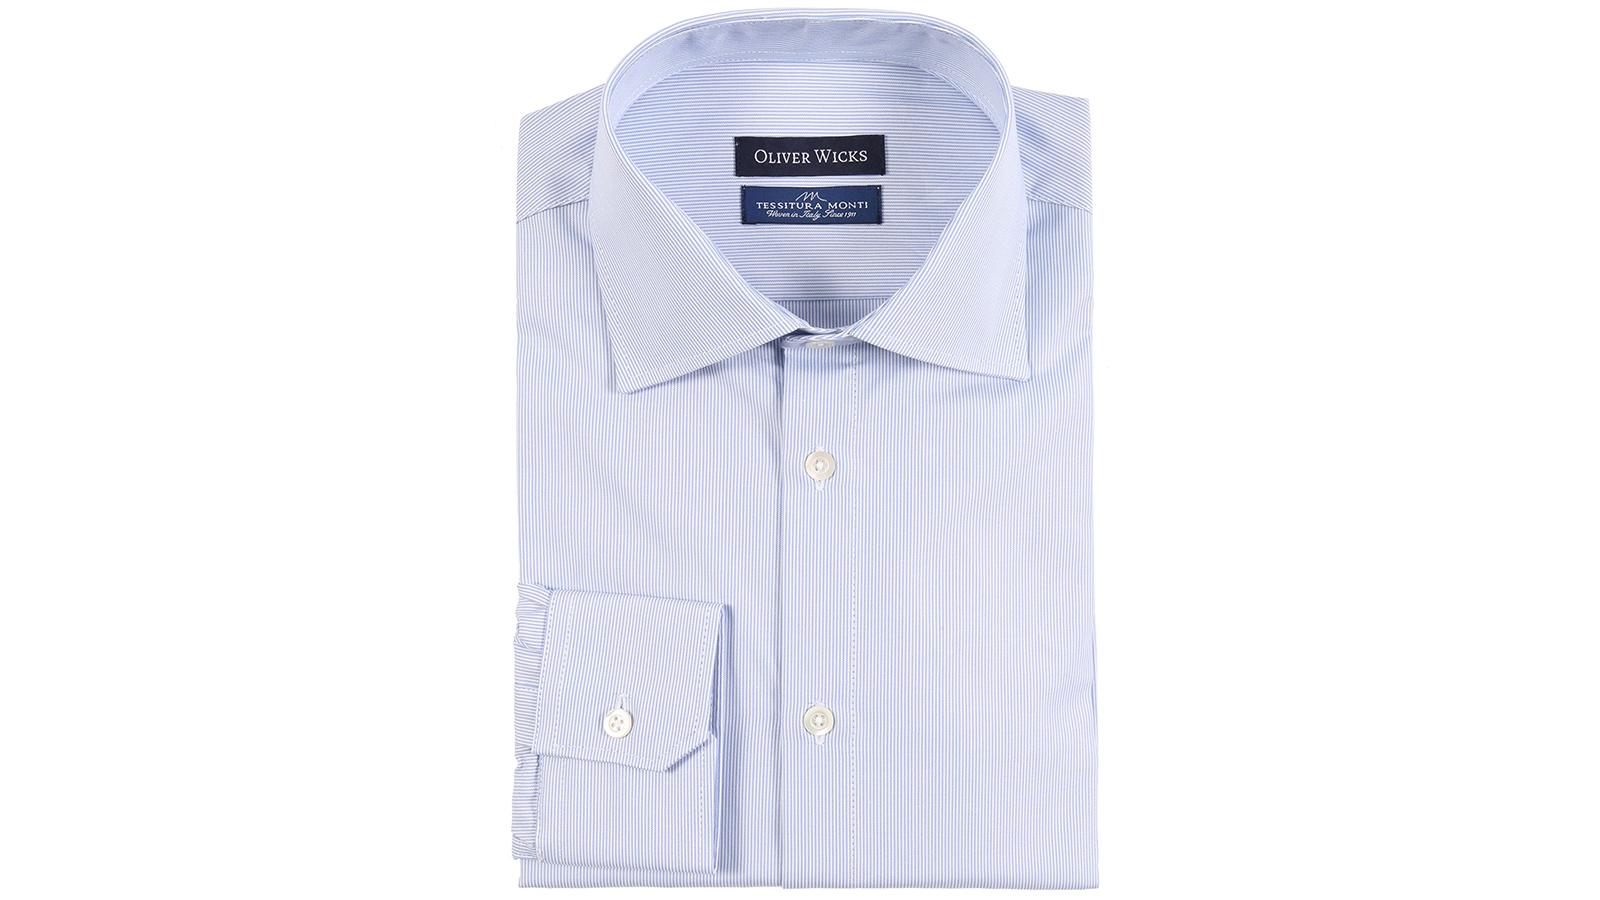 Light Blue Striped Micropattern Broadcloth Cotton Shirt - slider image